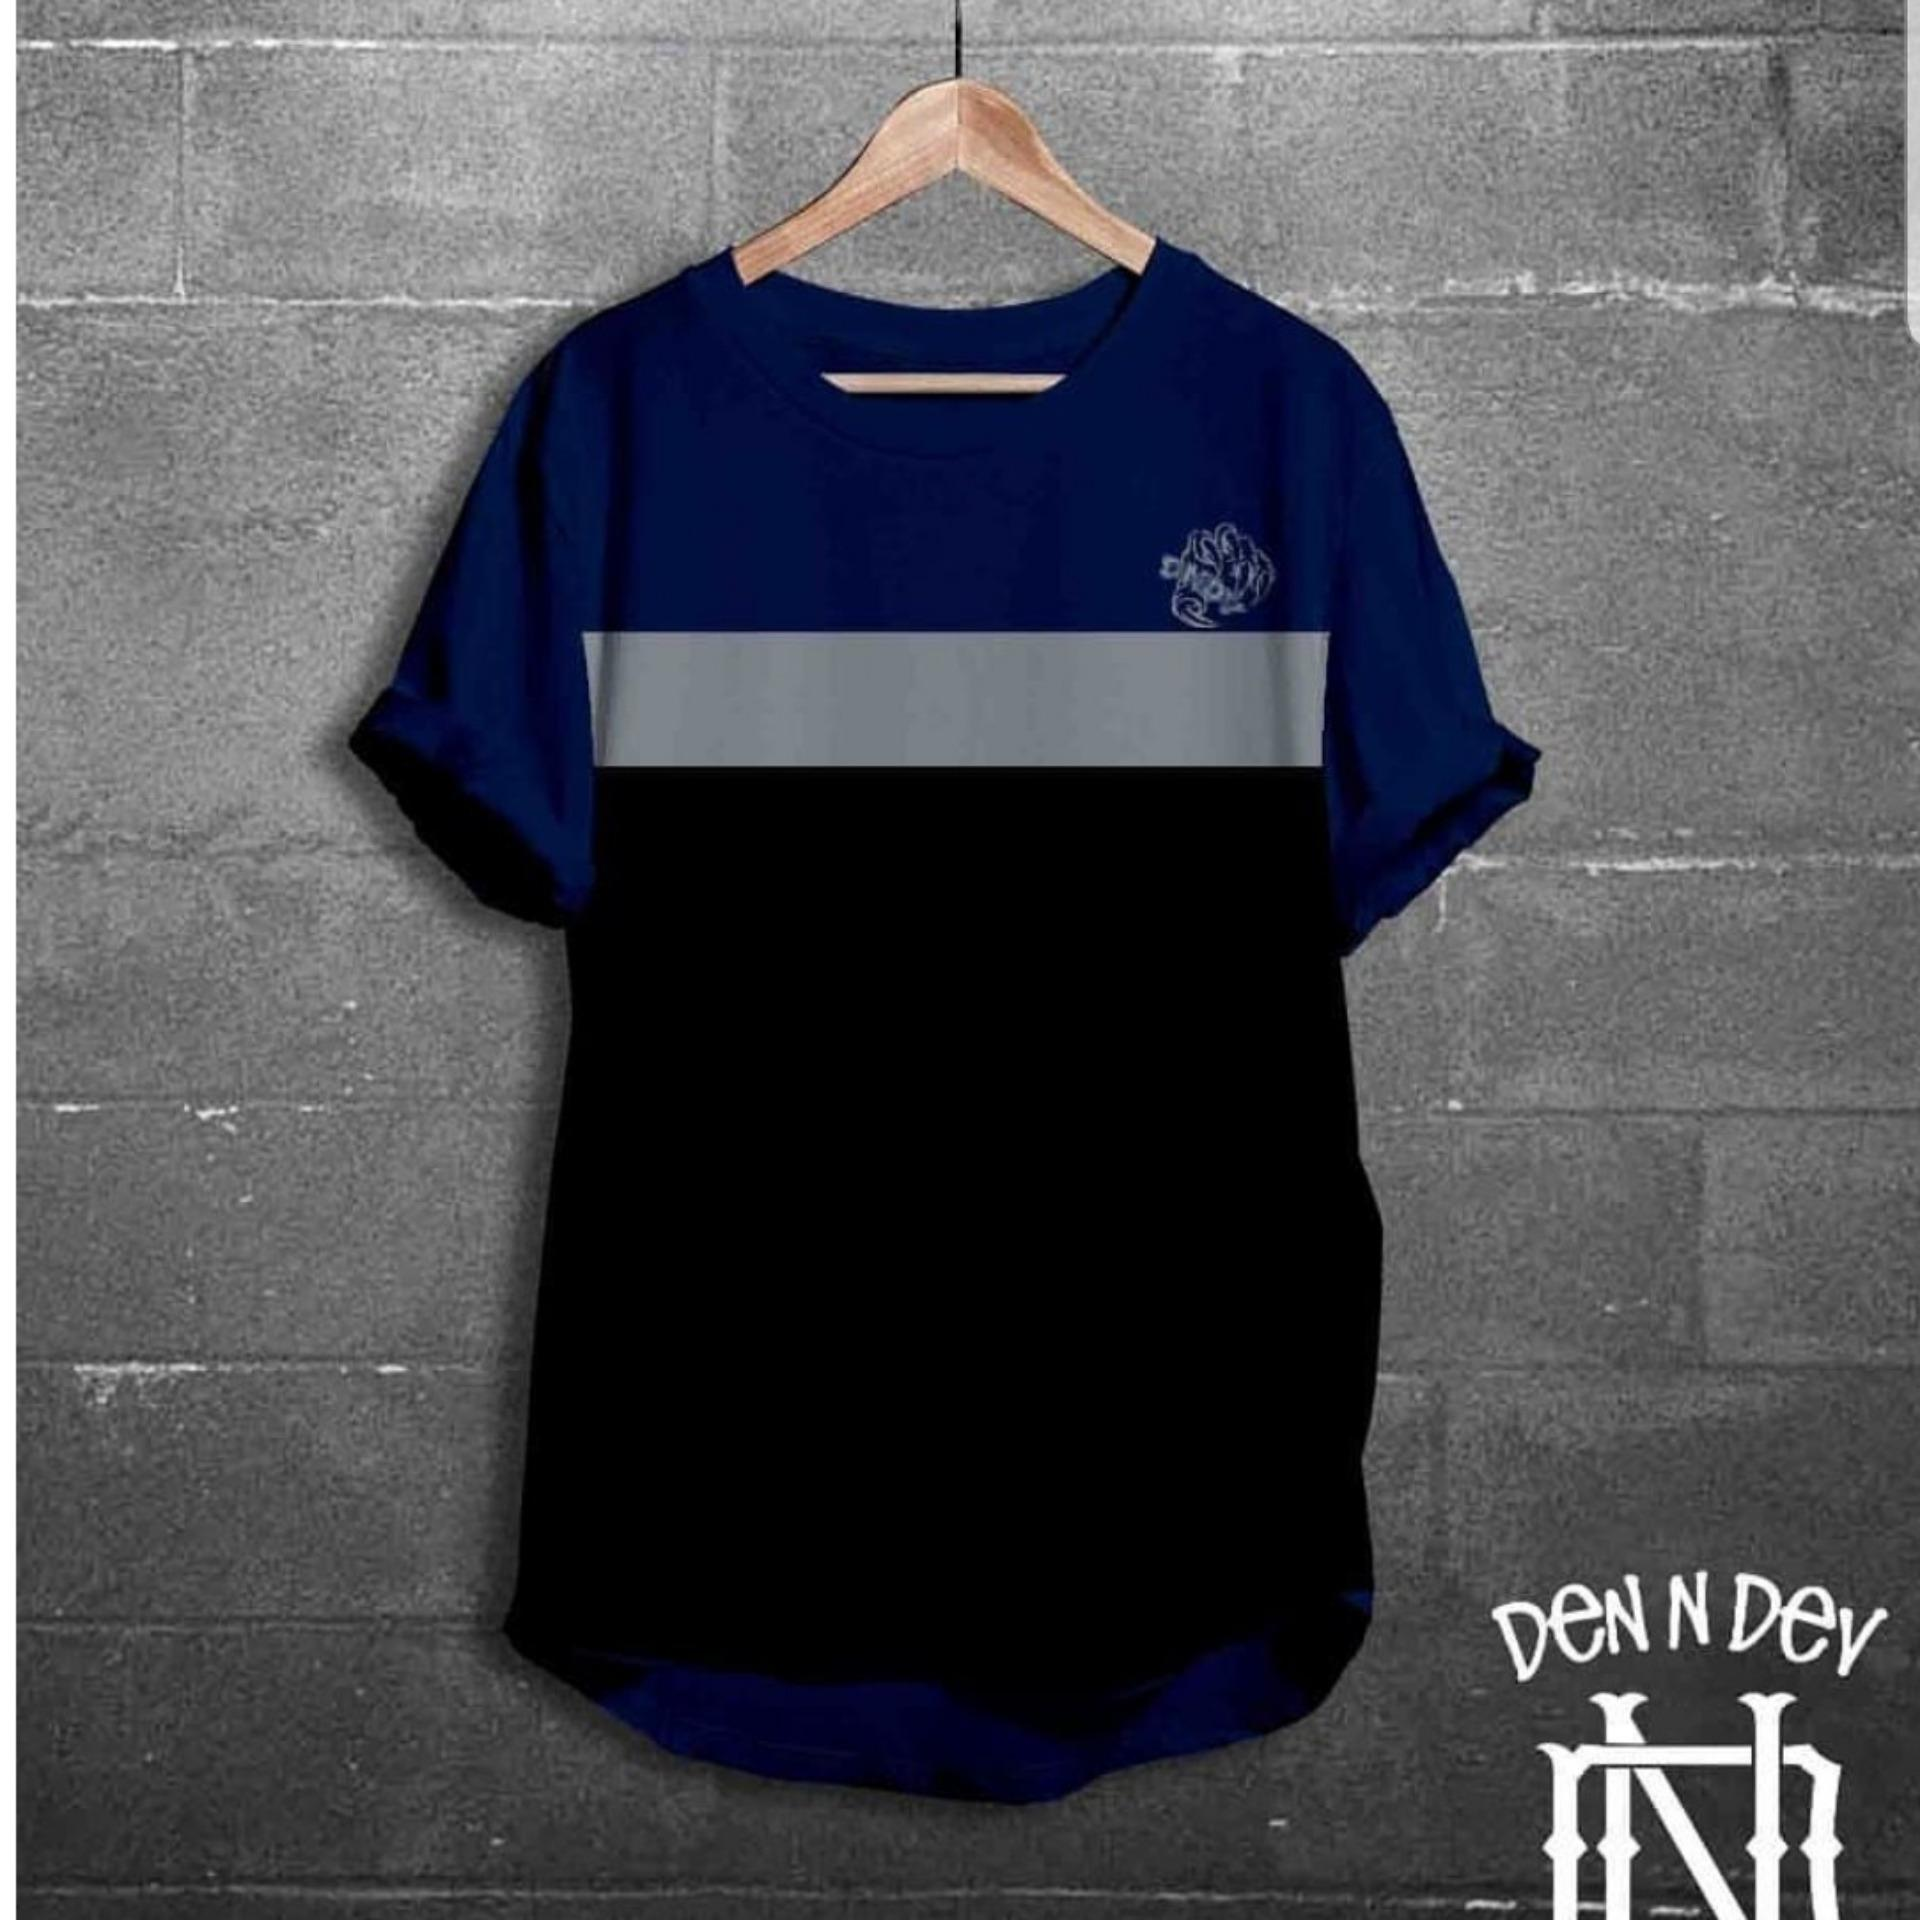 HIGH5 Fashion Pria Kaos Lengan Pendek DNDV CLAW Navy